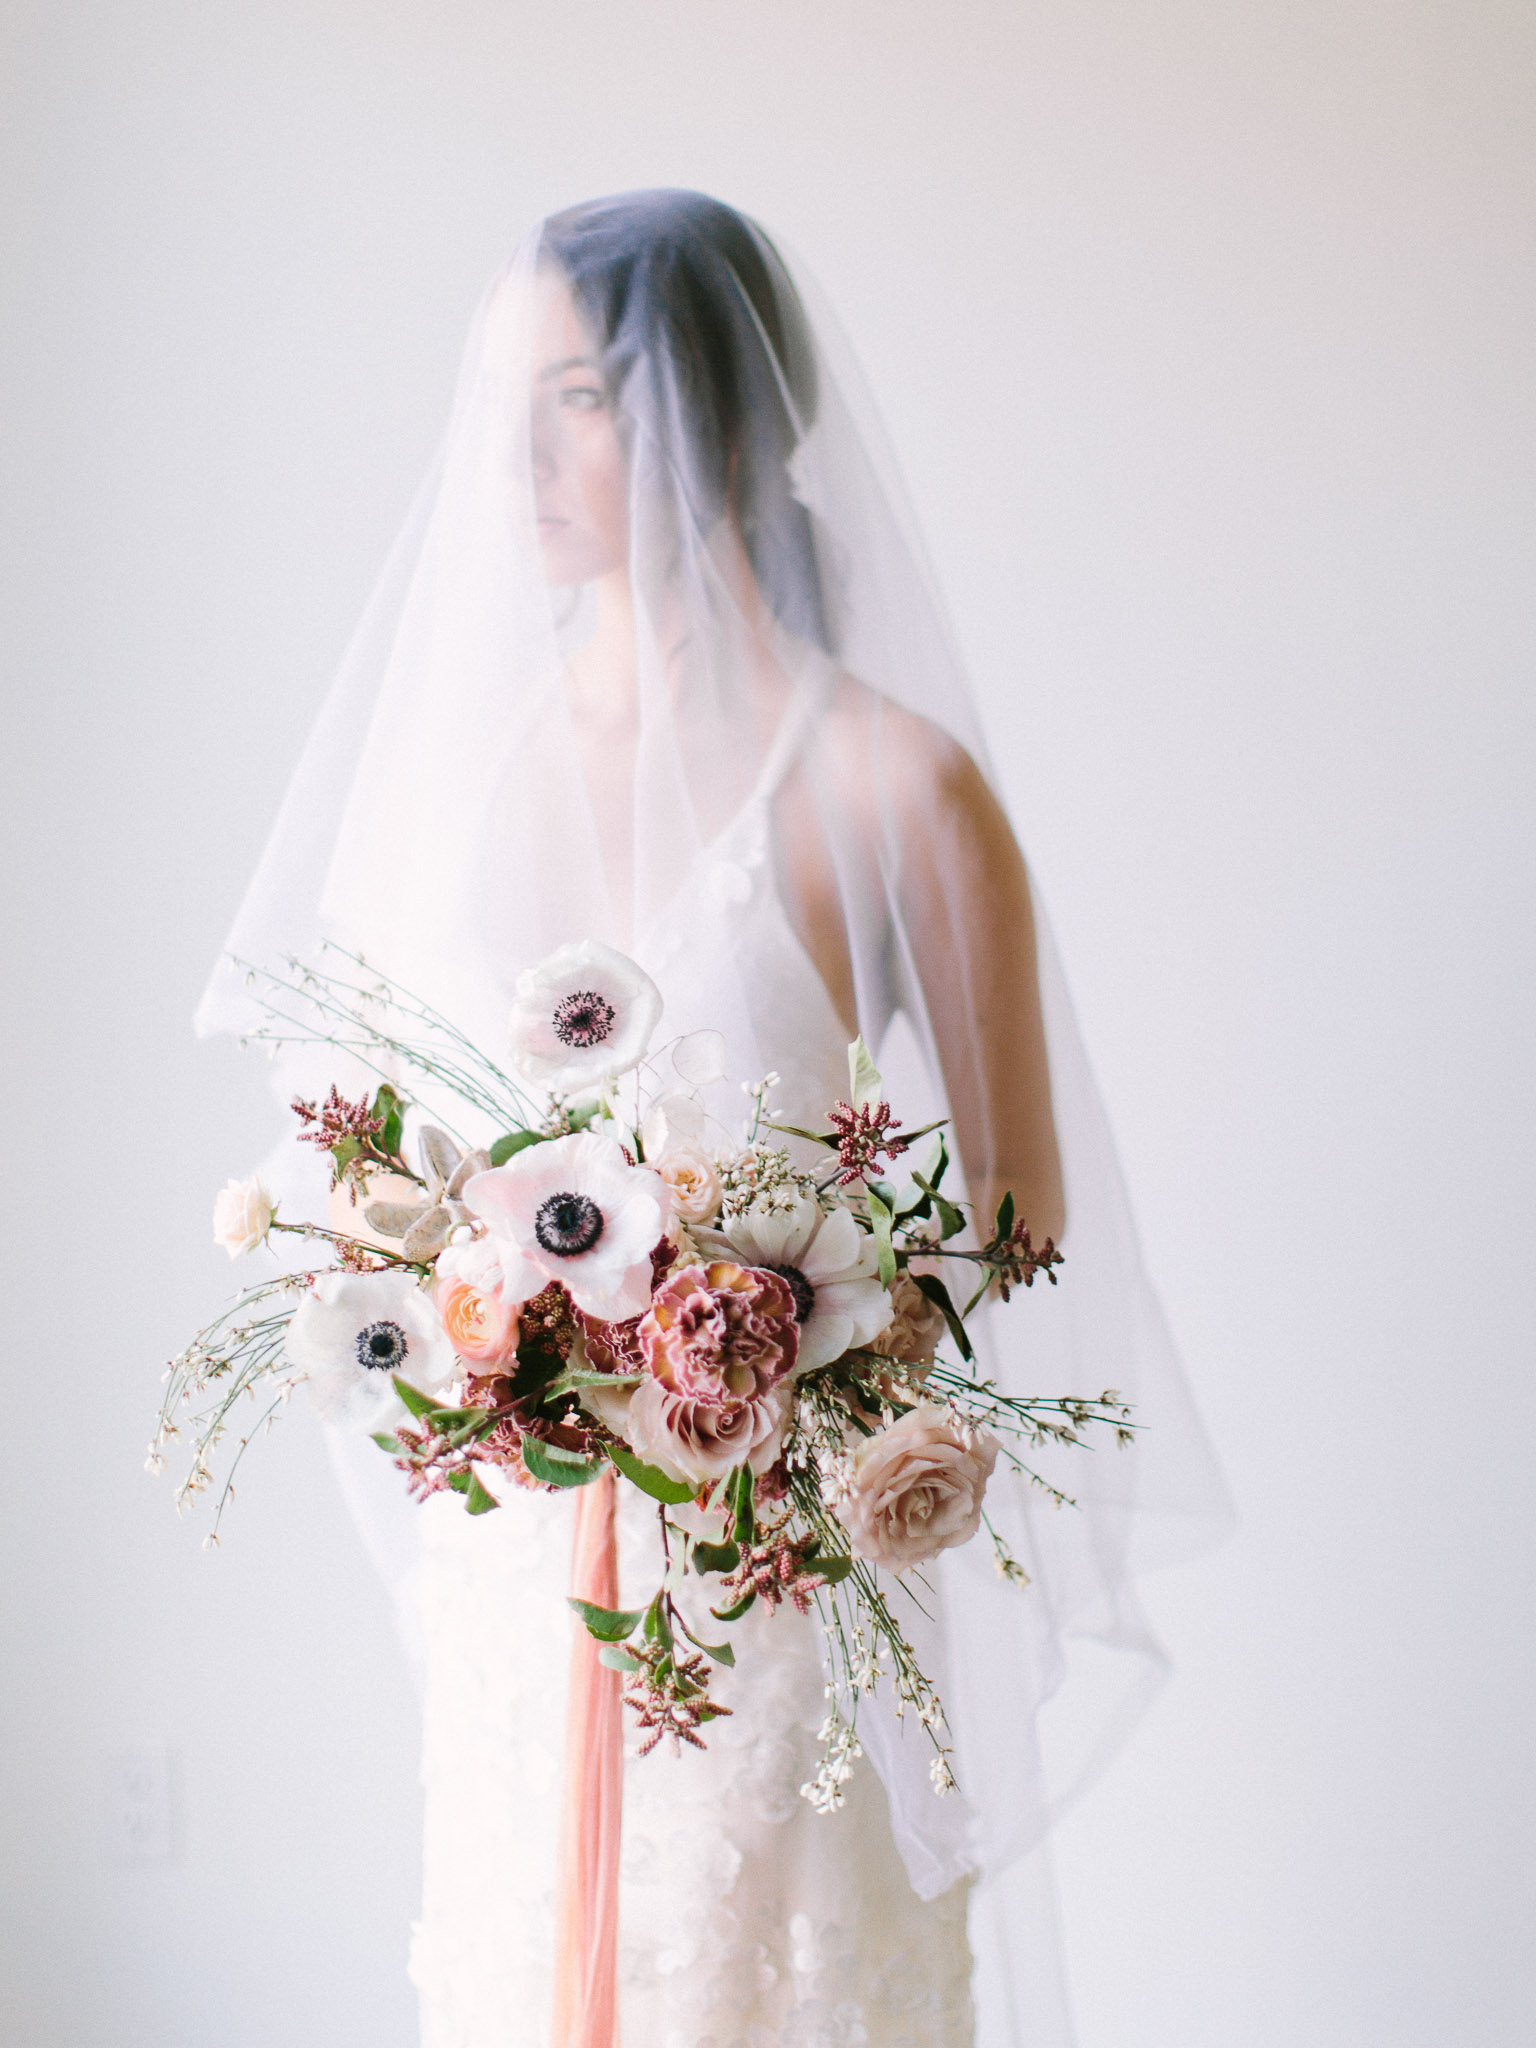 ModernNaturalStyledShoot_MaricleKang_Vancouver Wedding Photographer__0257.jpg